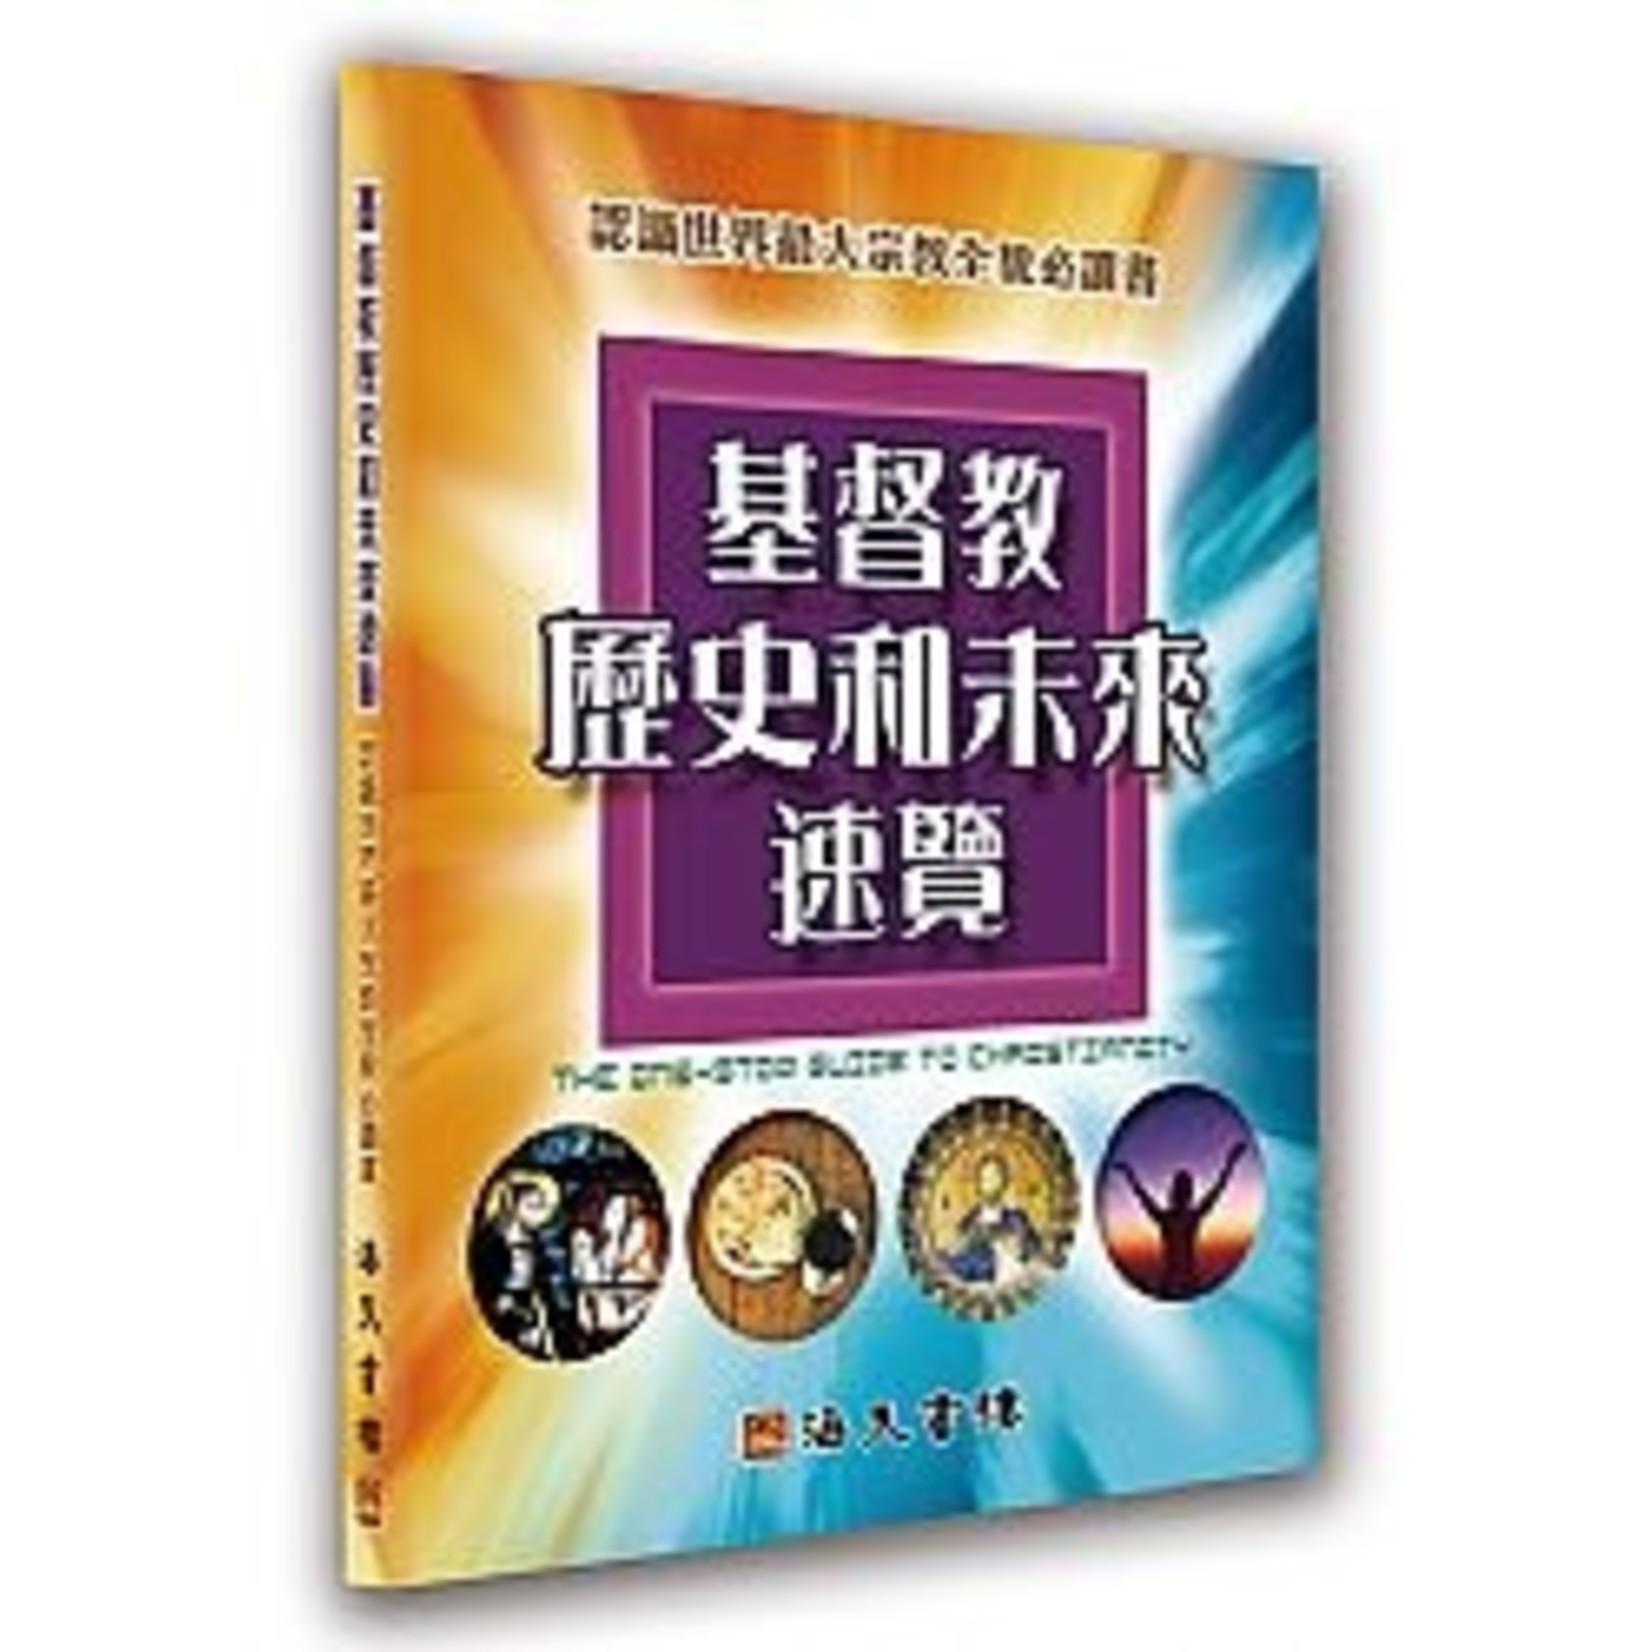 海天書樓 The Rock House Publishers 基督教歷史和未來速覽:認識世界最大宗教全貌必讀書 The One-Stop Guide to Christianity